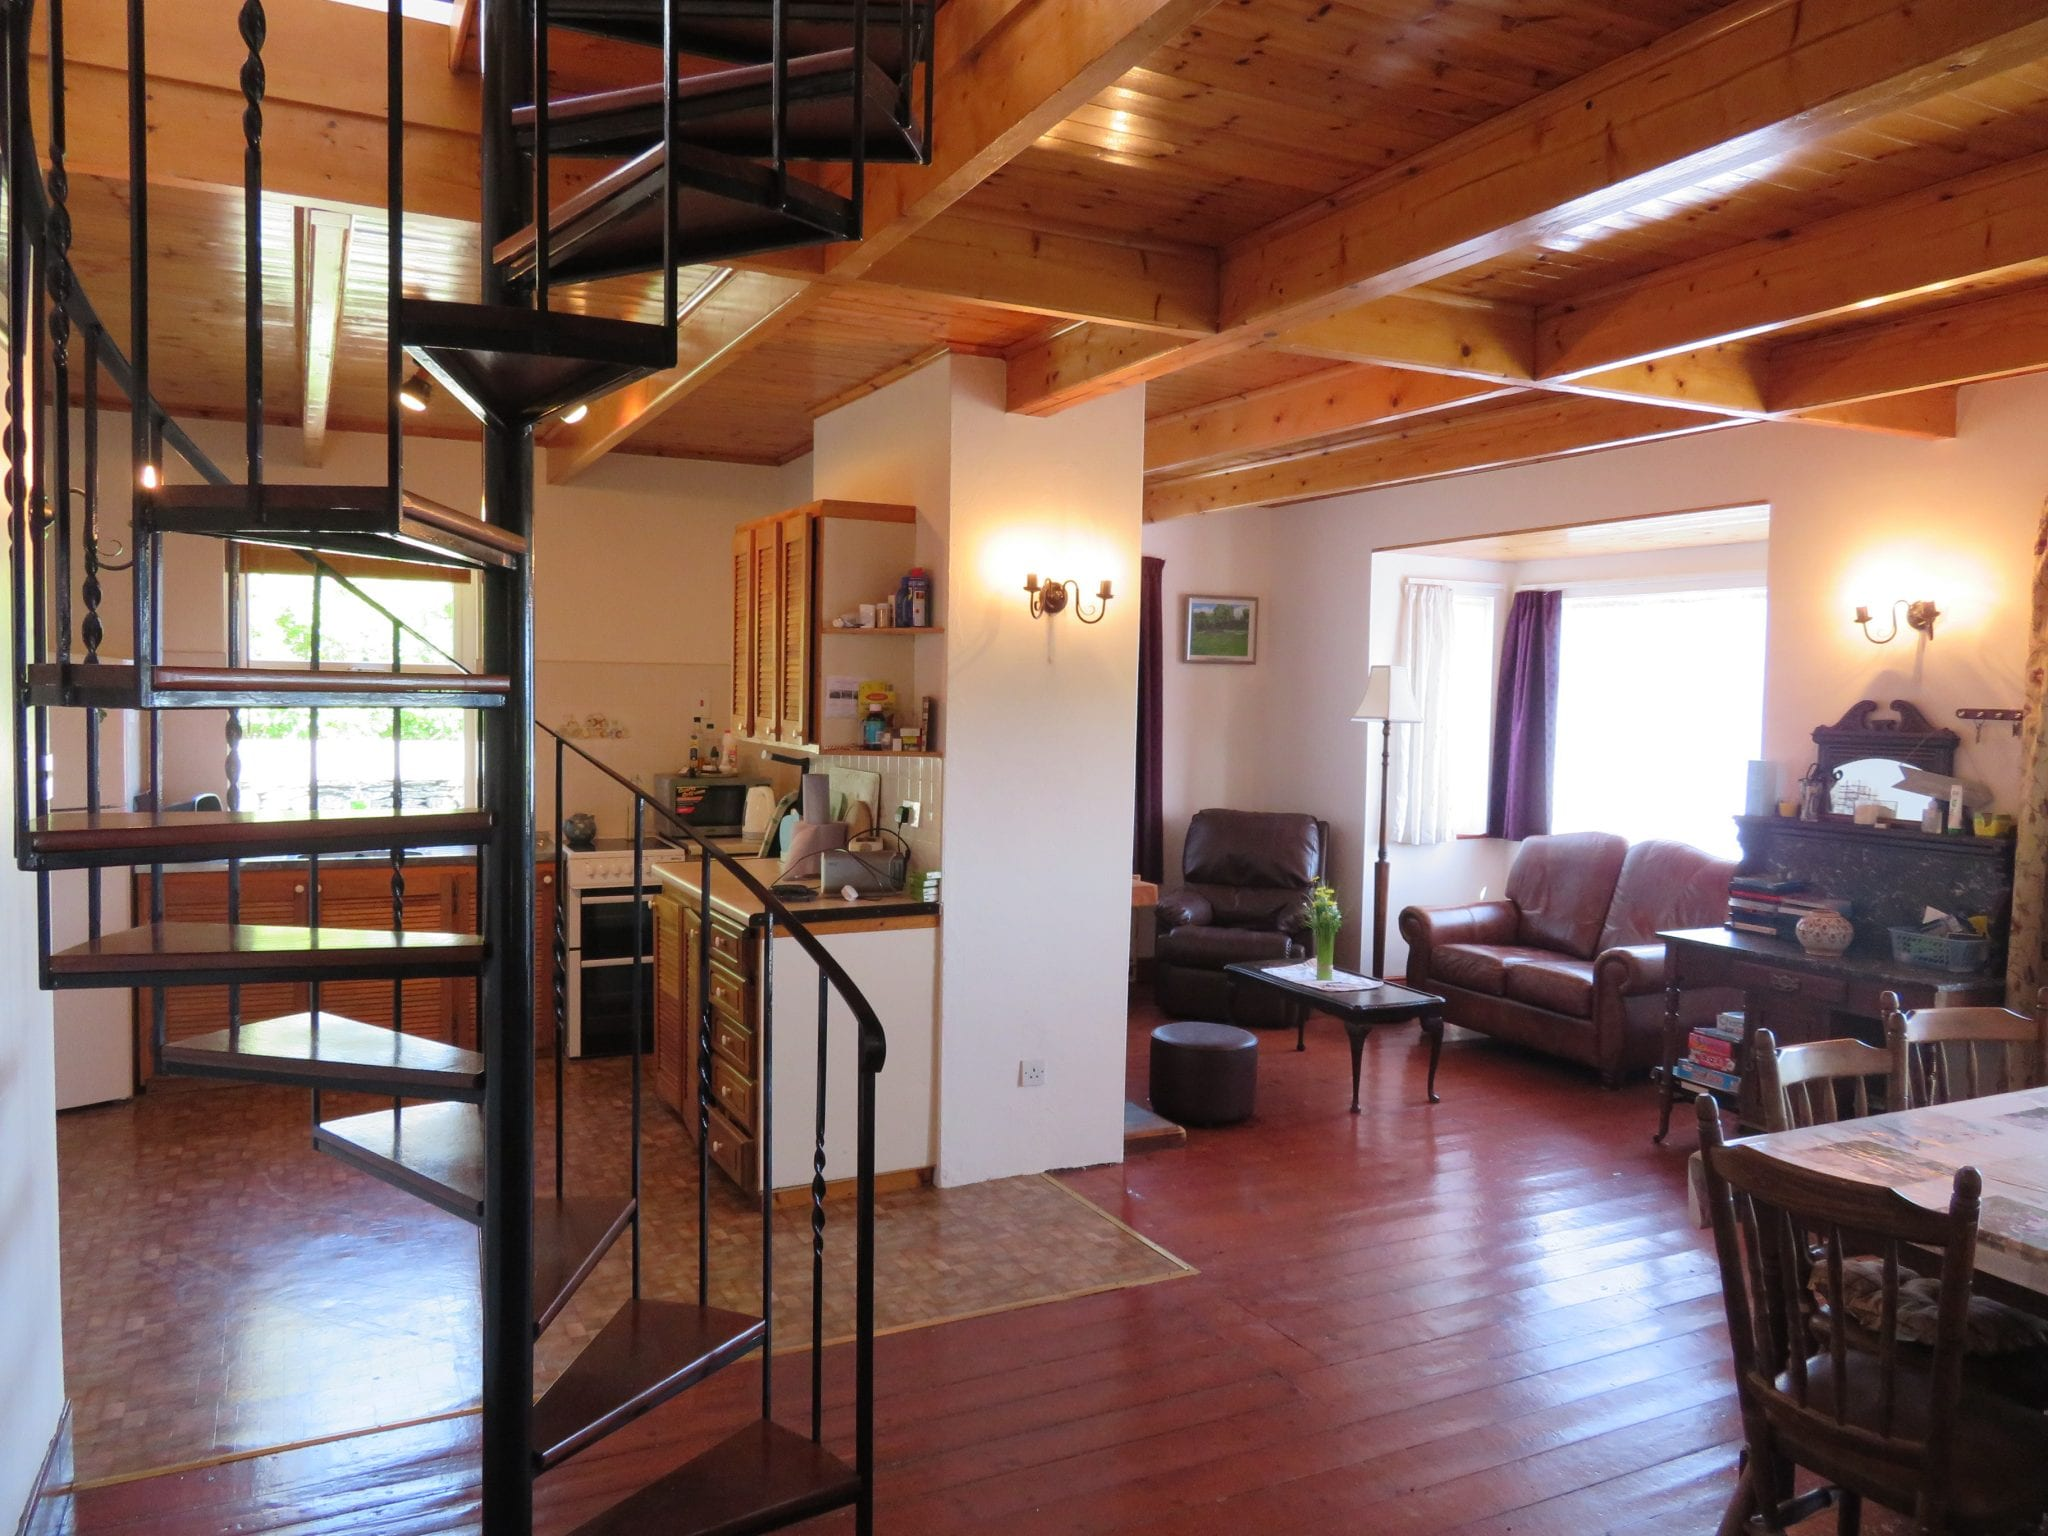 4. IMG_0018 - downstairs